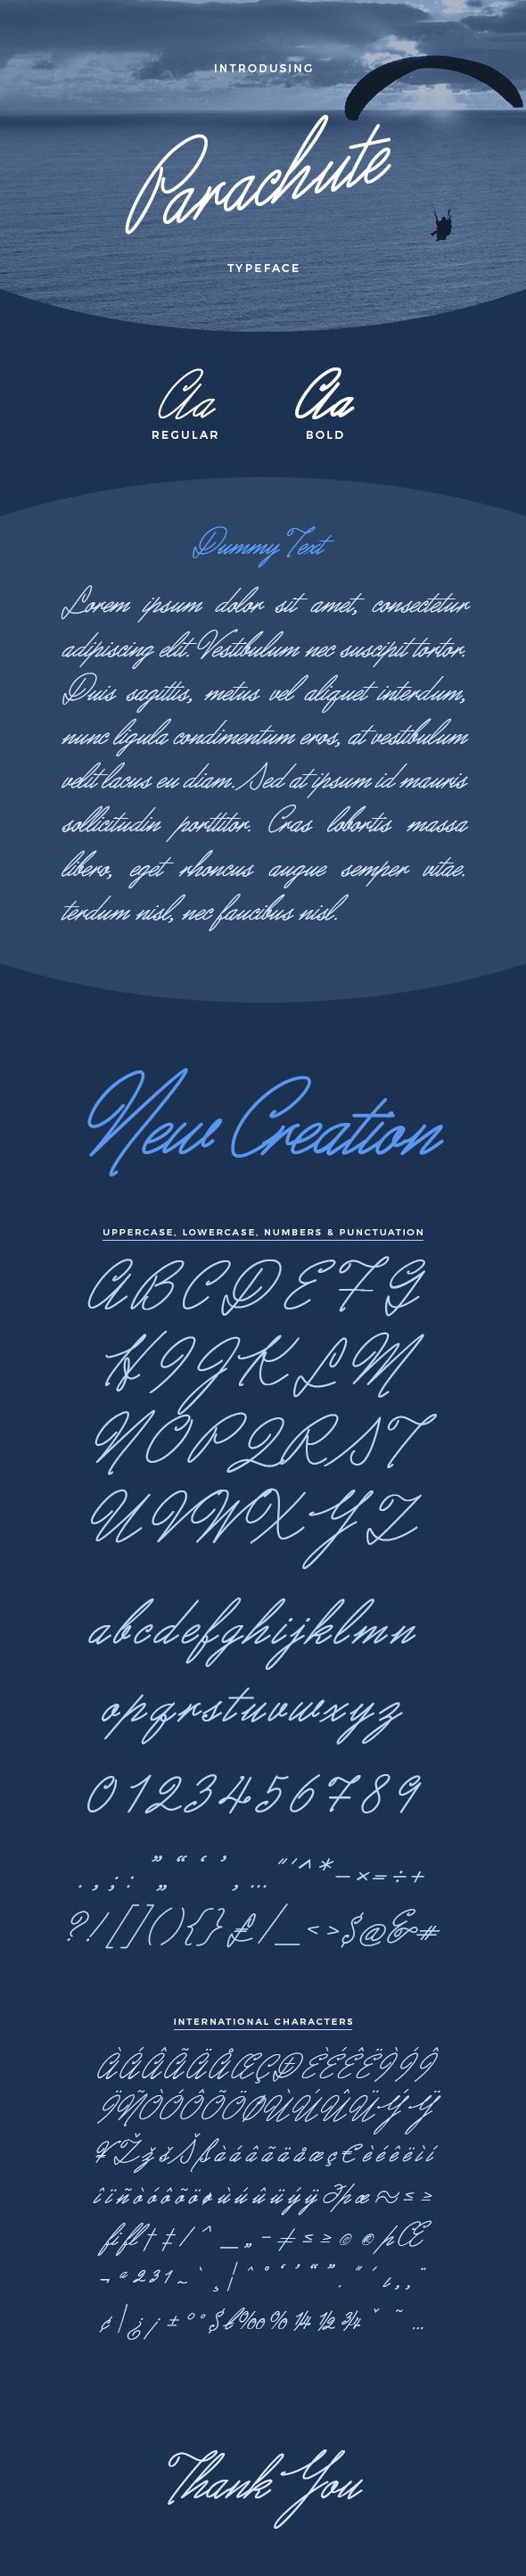 Parachute Typeface - Calligraphy Script